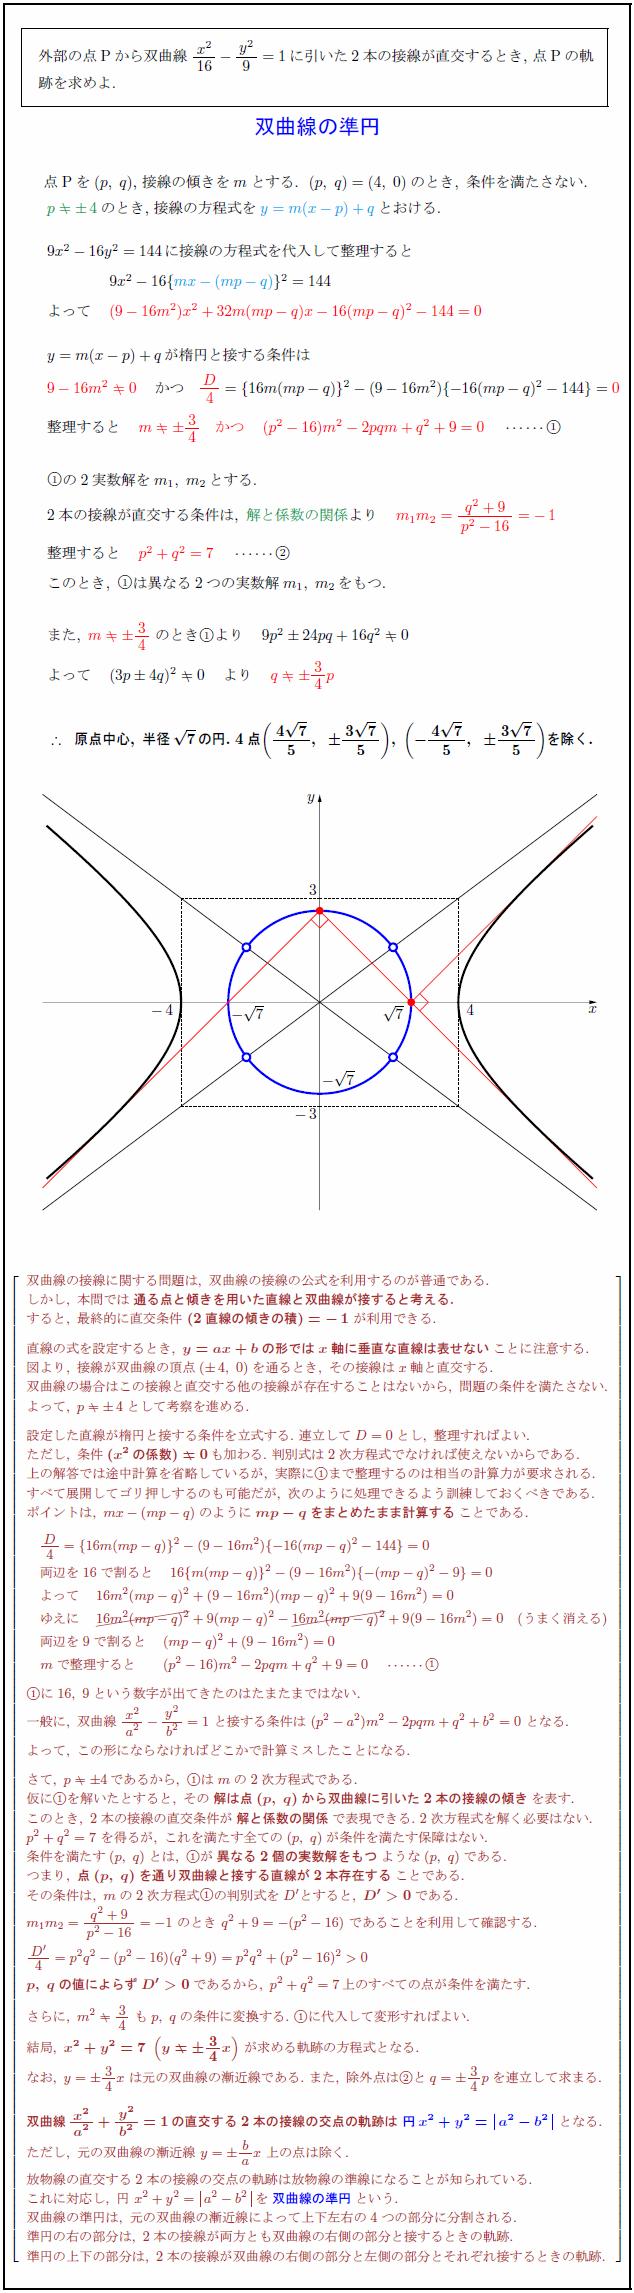 hyperbola-director-circle